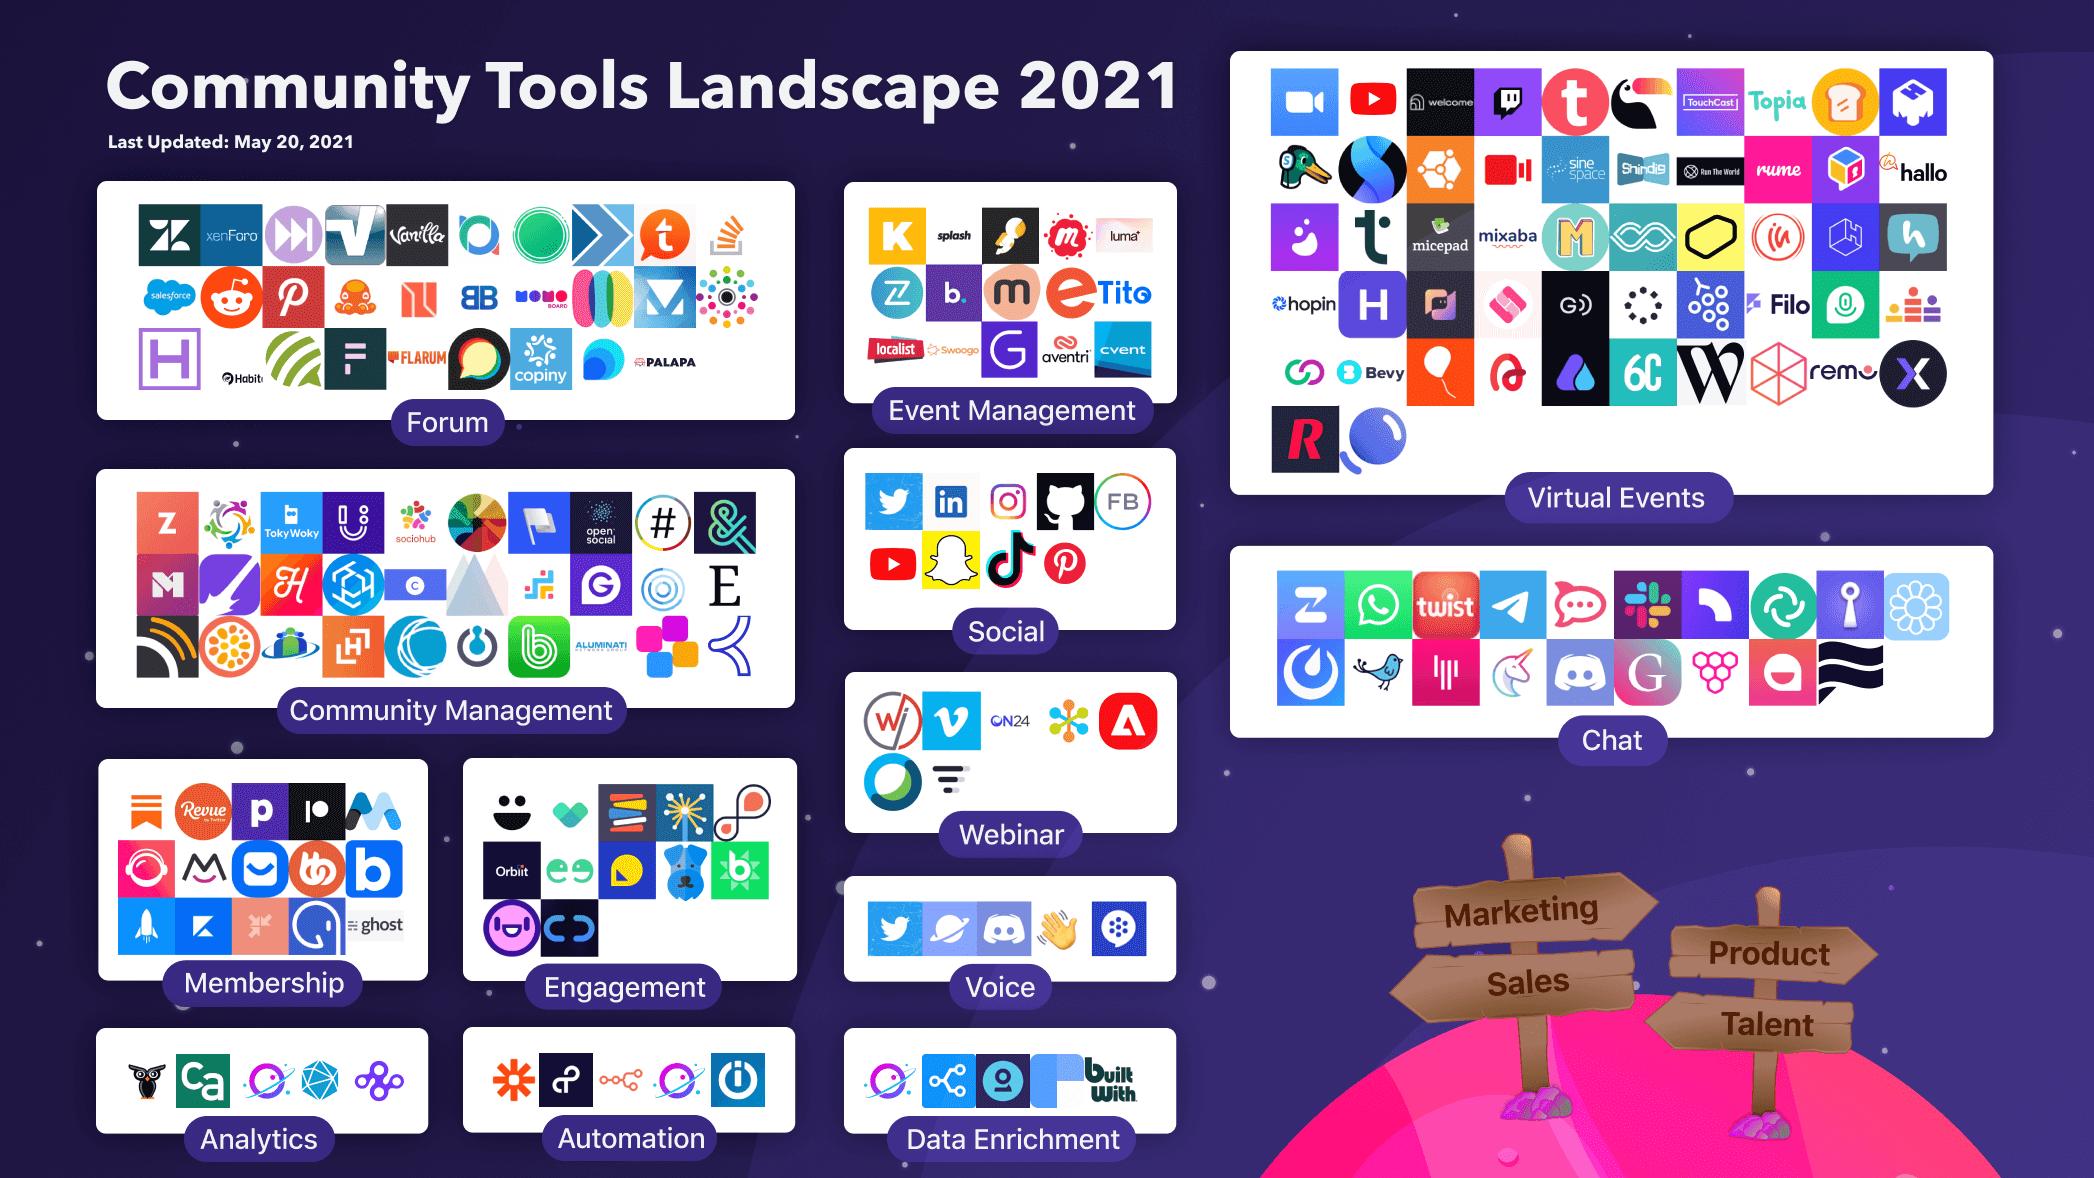 Orbit's Community Tools Landscape